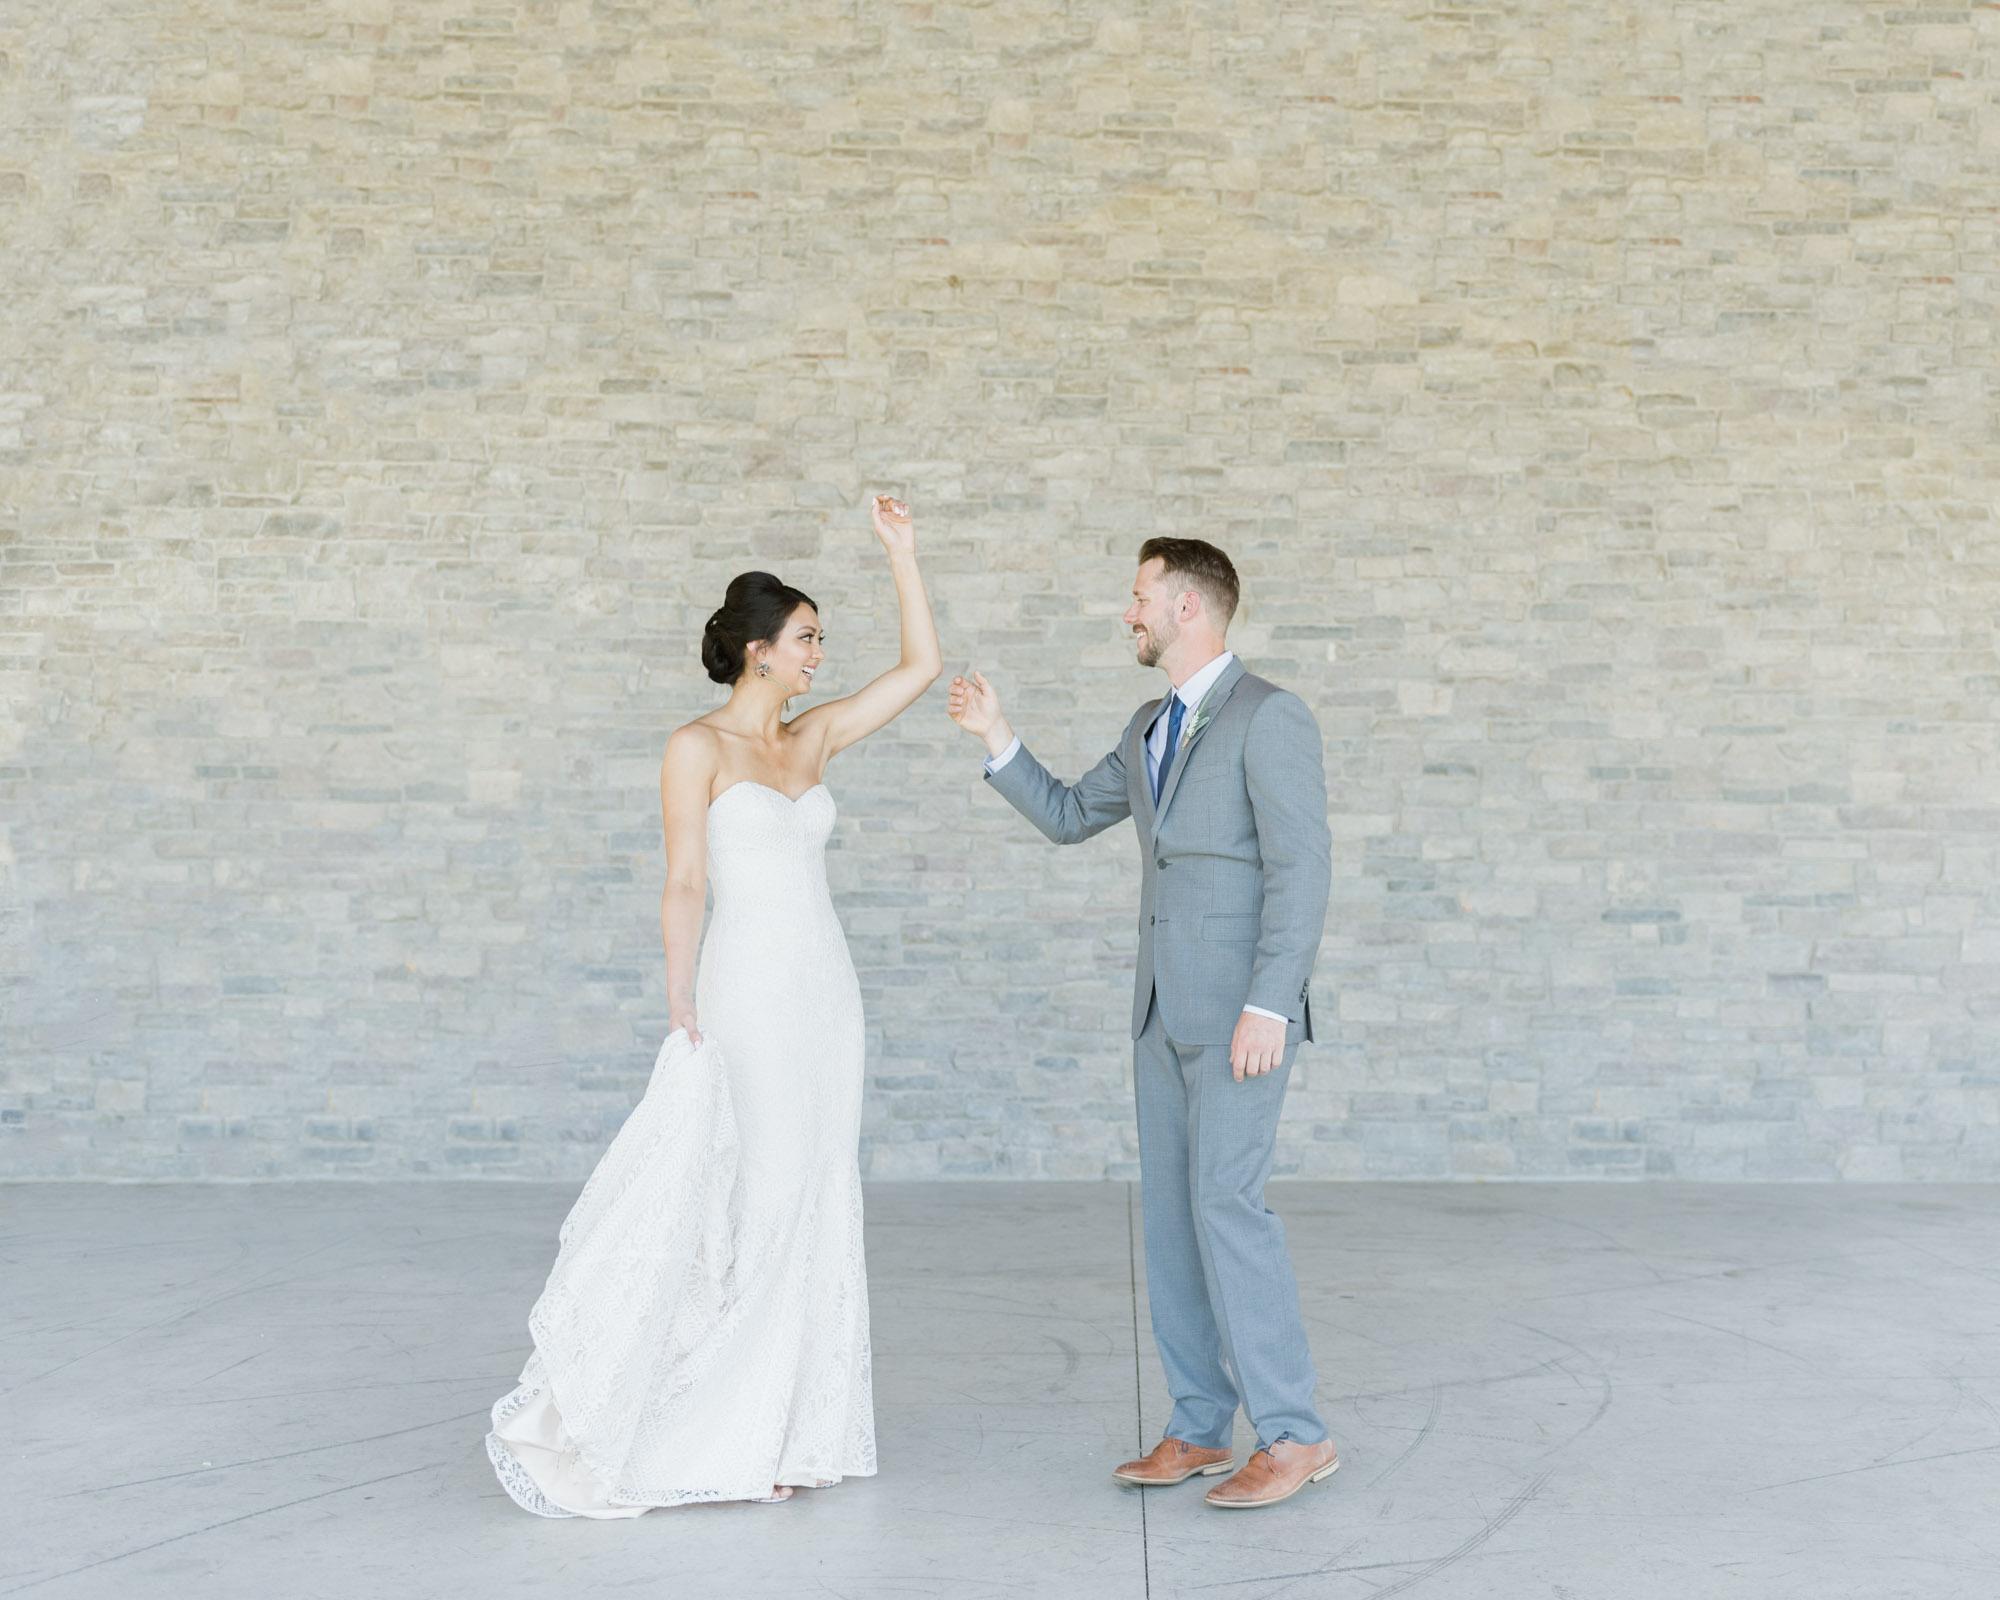 Gavyn-Taylor-Photo_Woolen-Mills-Wedding (29 of 143).jpg